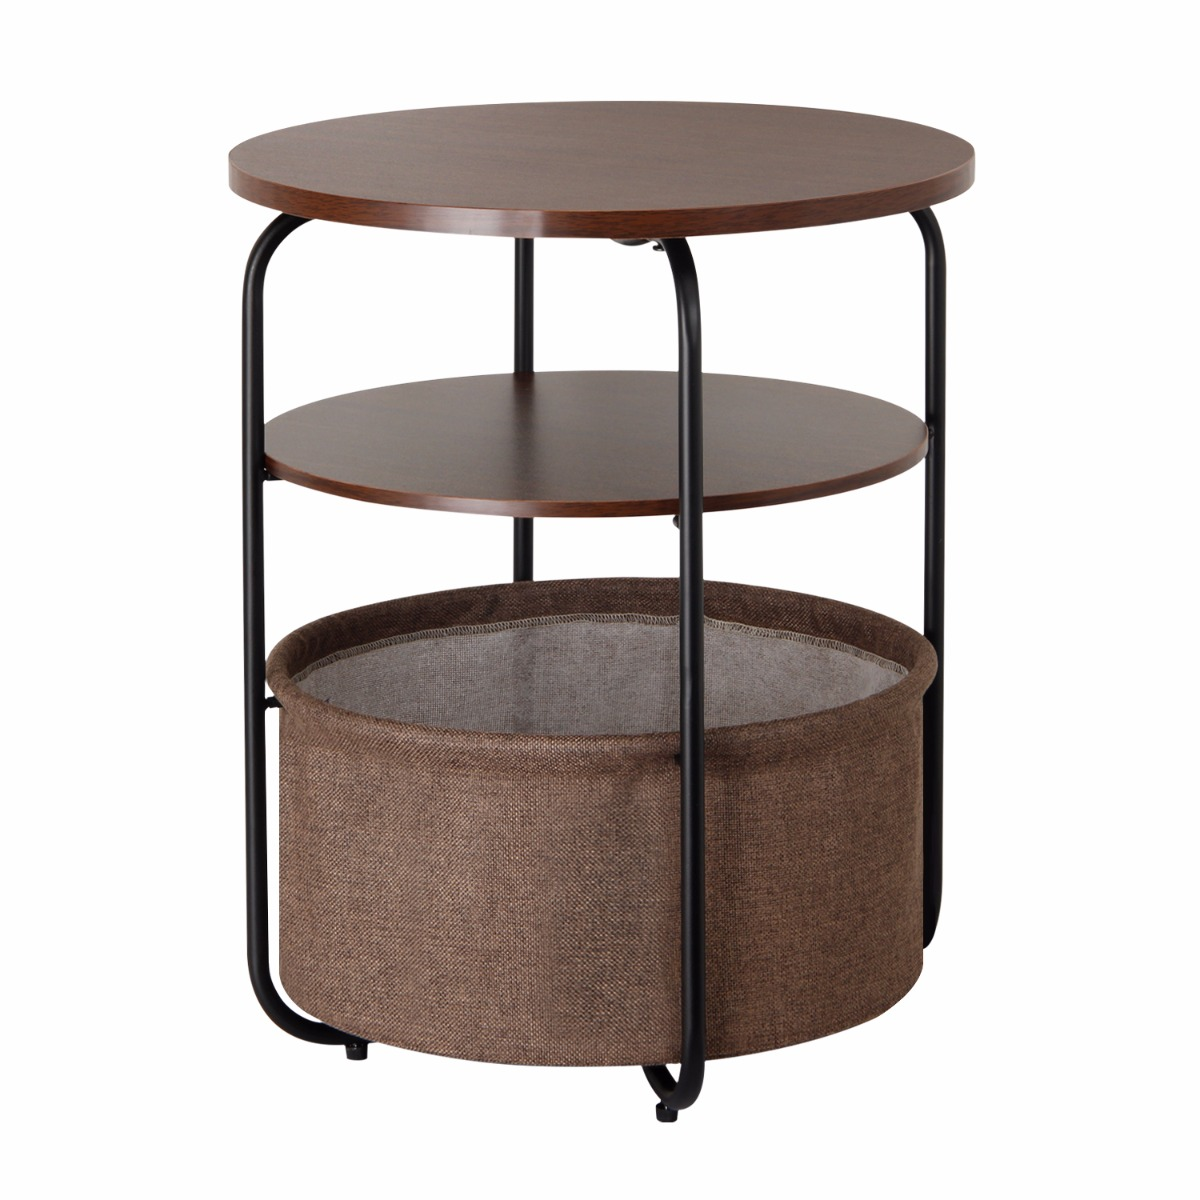 Lifewit 3-tier Round Side End Table with Storage Basket, Nightstand, Espresso